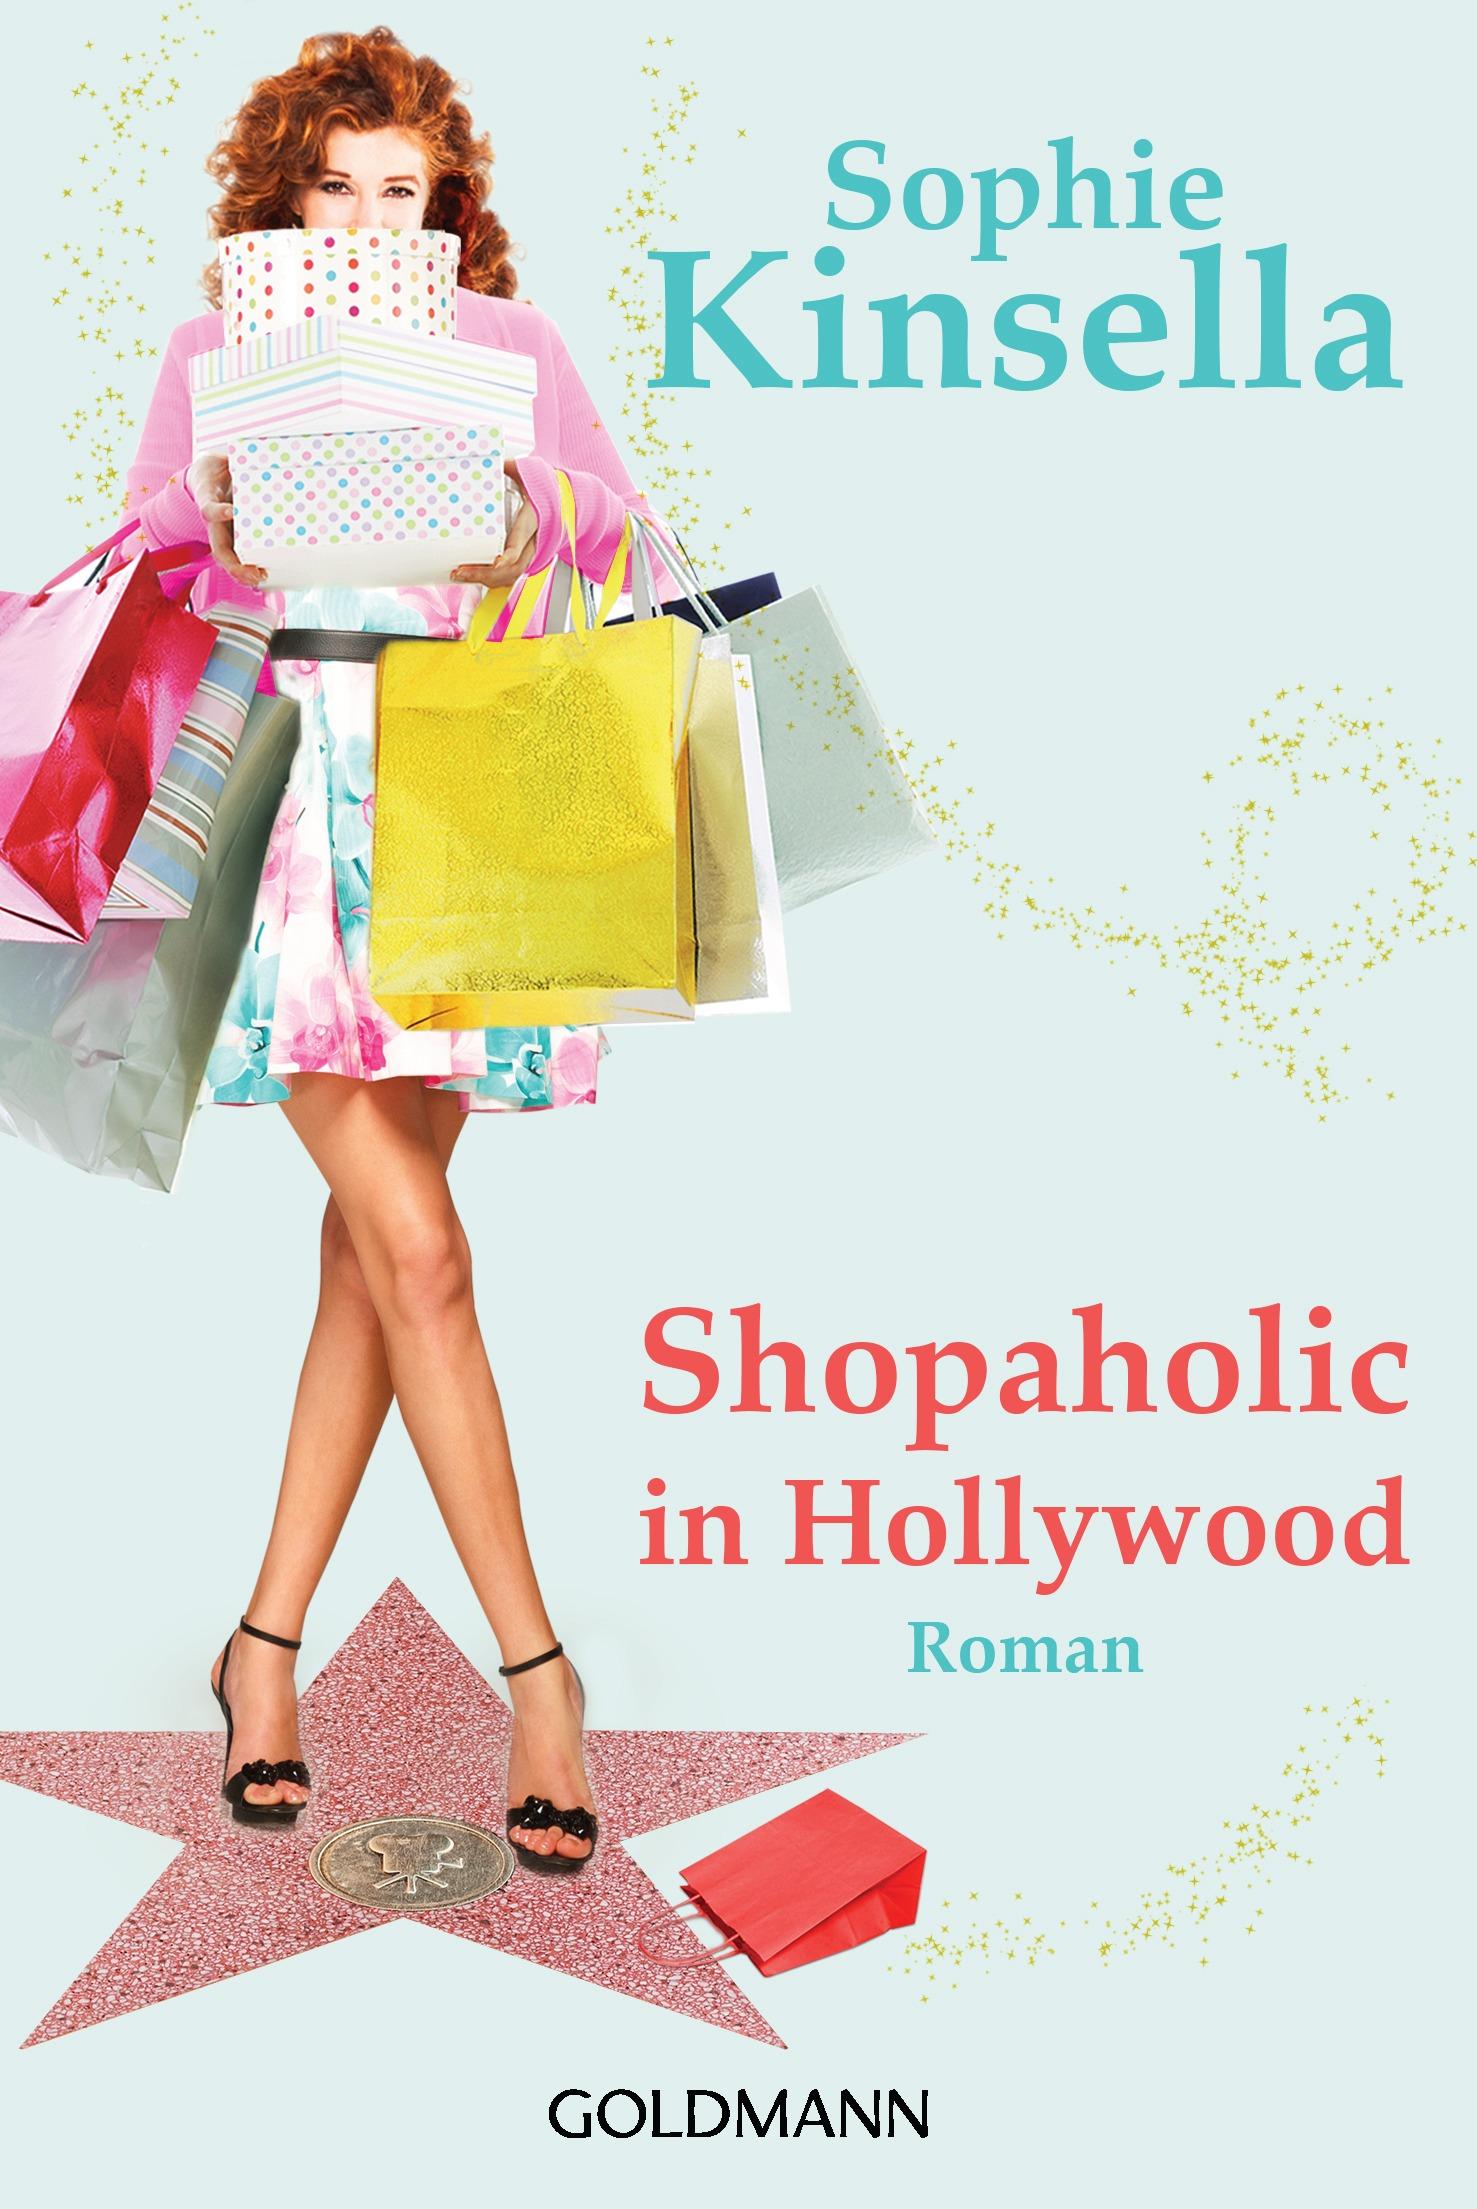 Shopaholic in Hollywood - Sophie Kinsella [Taschenbuch]